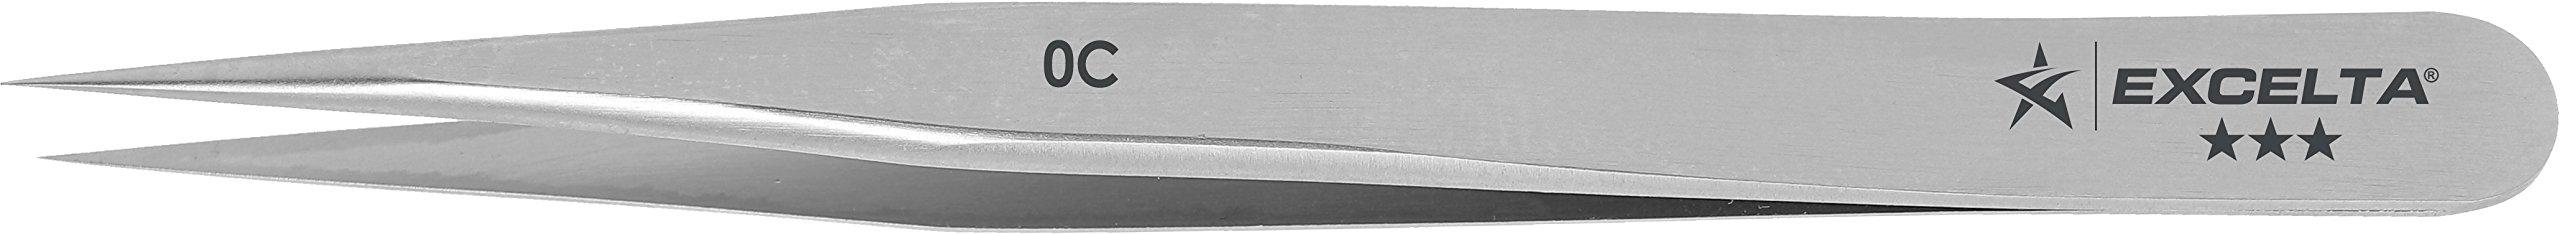 Excelta - 0C - Tweezers - Fine Point - Miniature - Straight -Three Star - Carbon Steel, 0.06'' Height, 0.29599999999999999'' Wide, 3.5'' Length